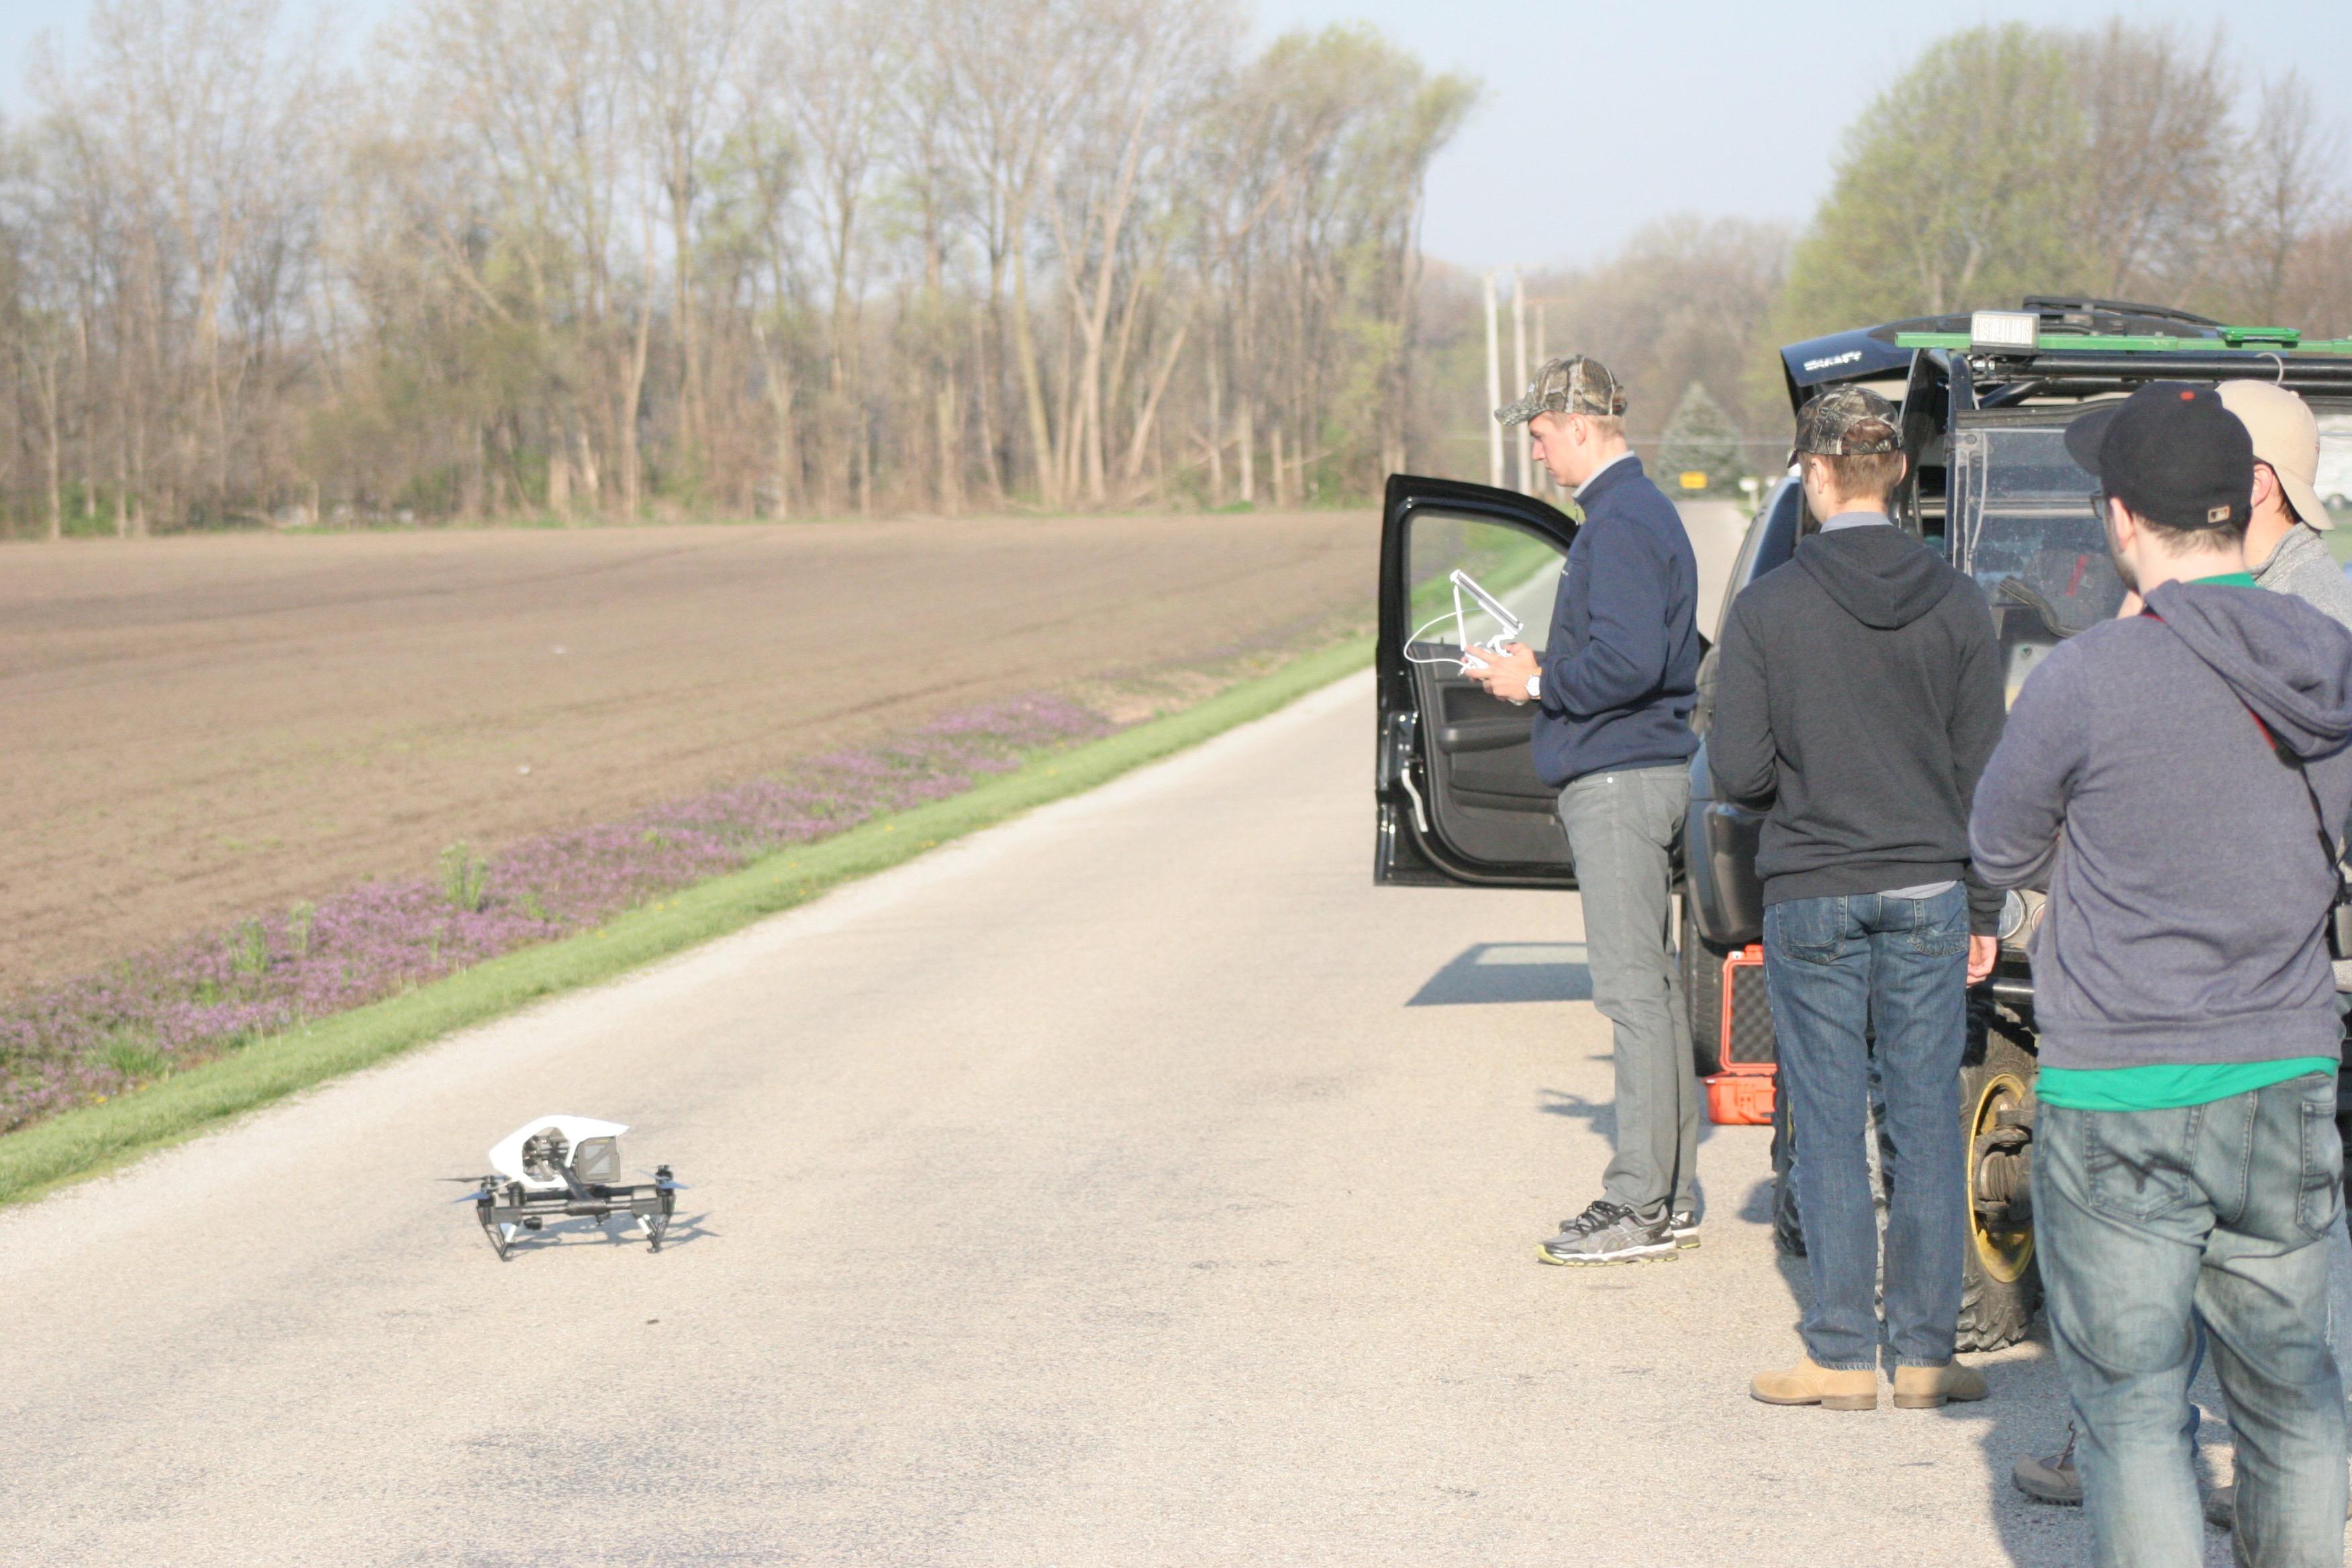 preparing-to-launch-drone.jpg